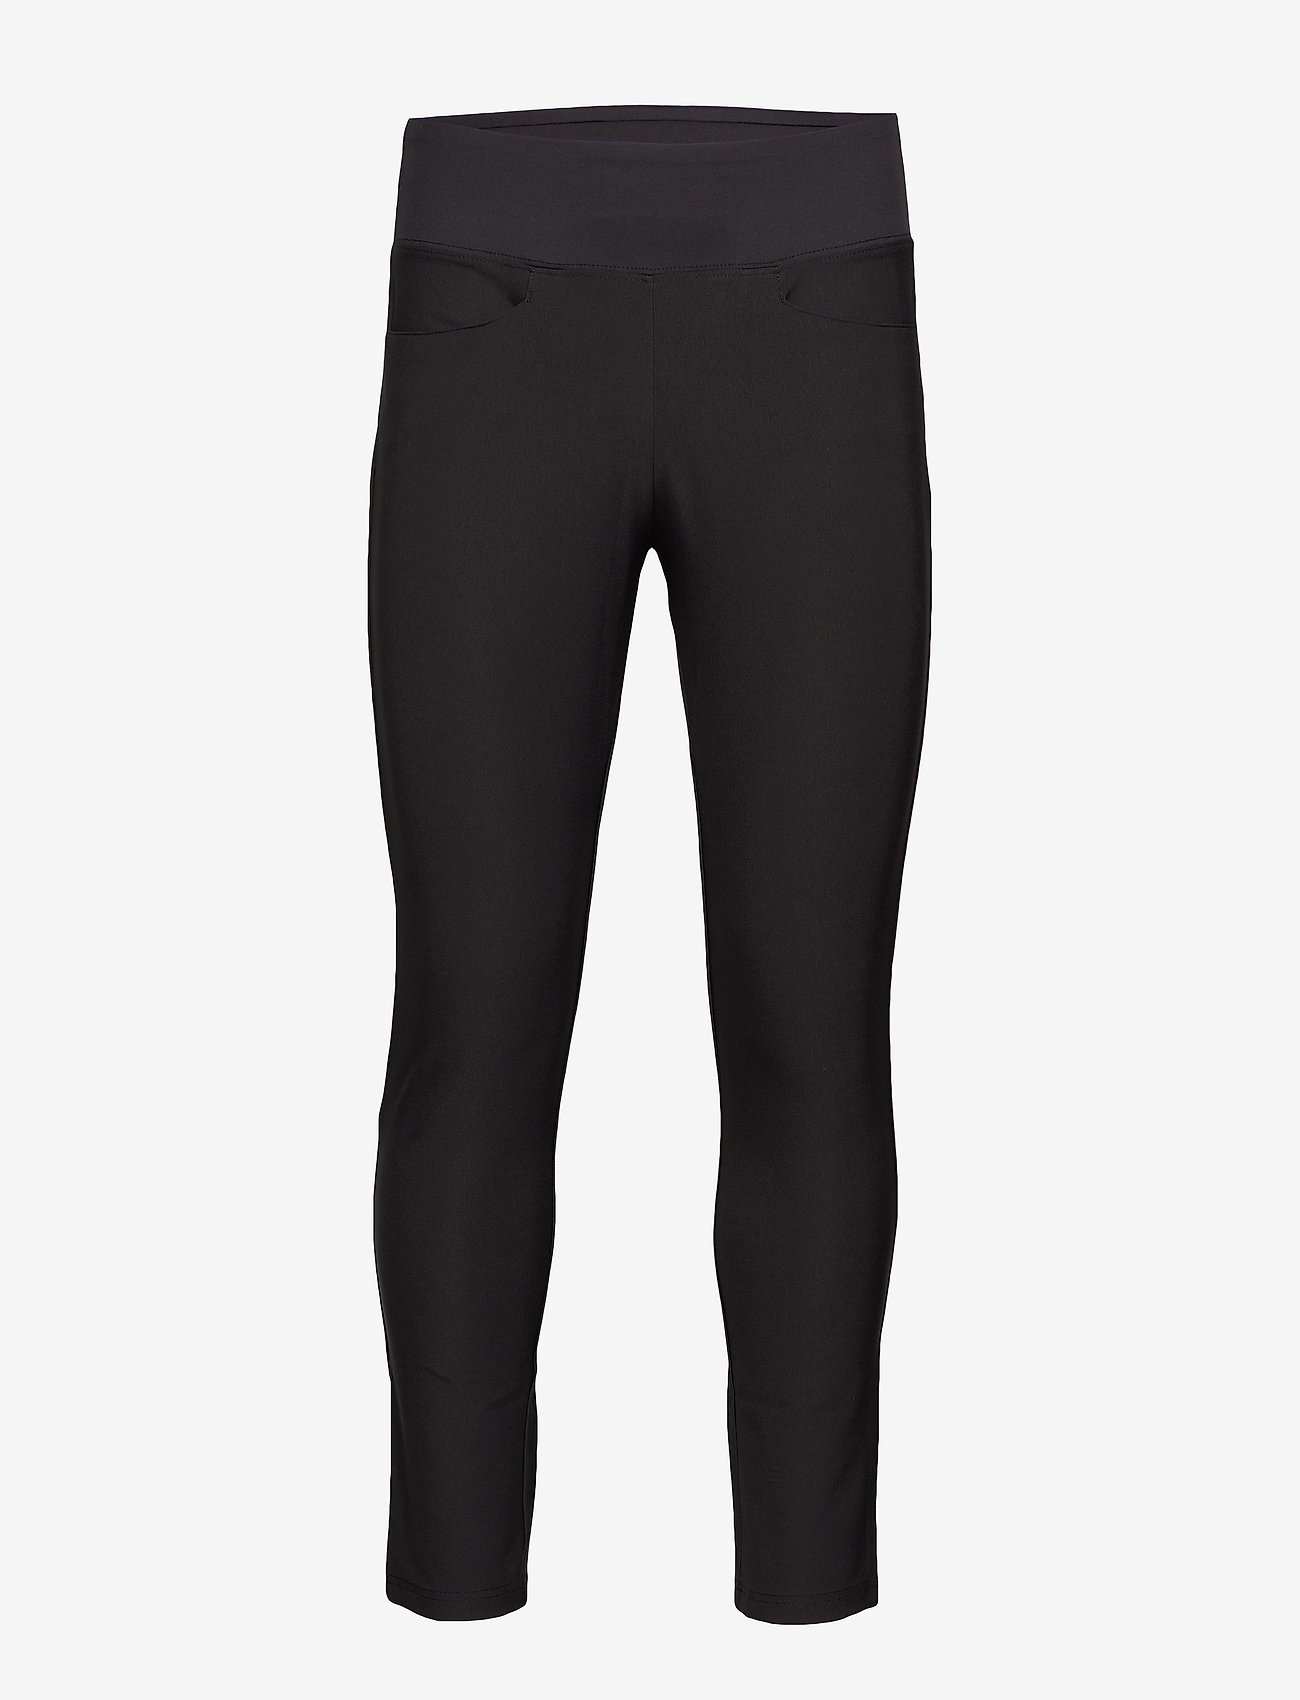 PUMA Golf - PWRSHAPE Pant - golfbroeken - puma black - 0